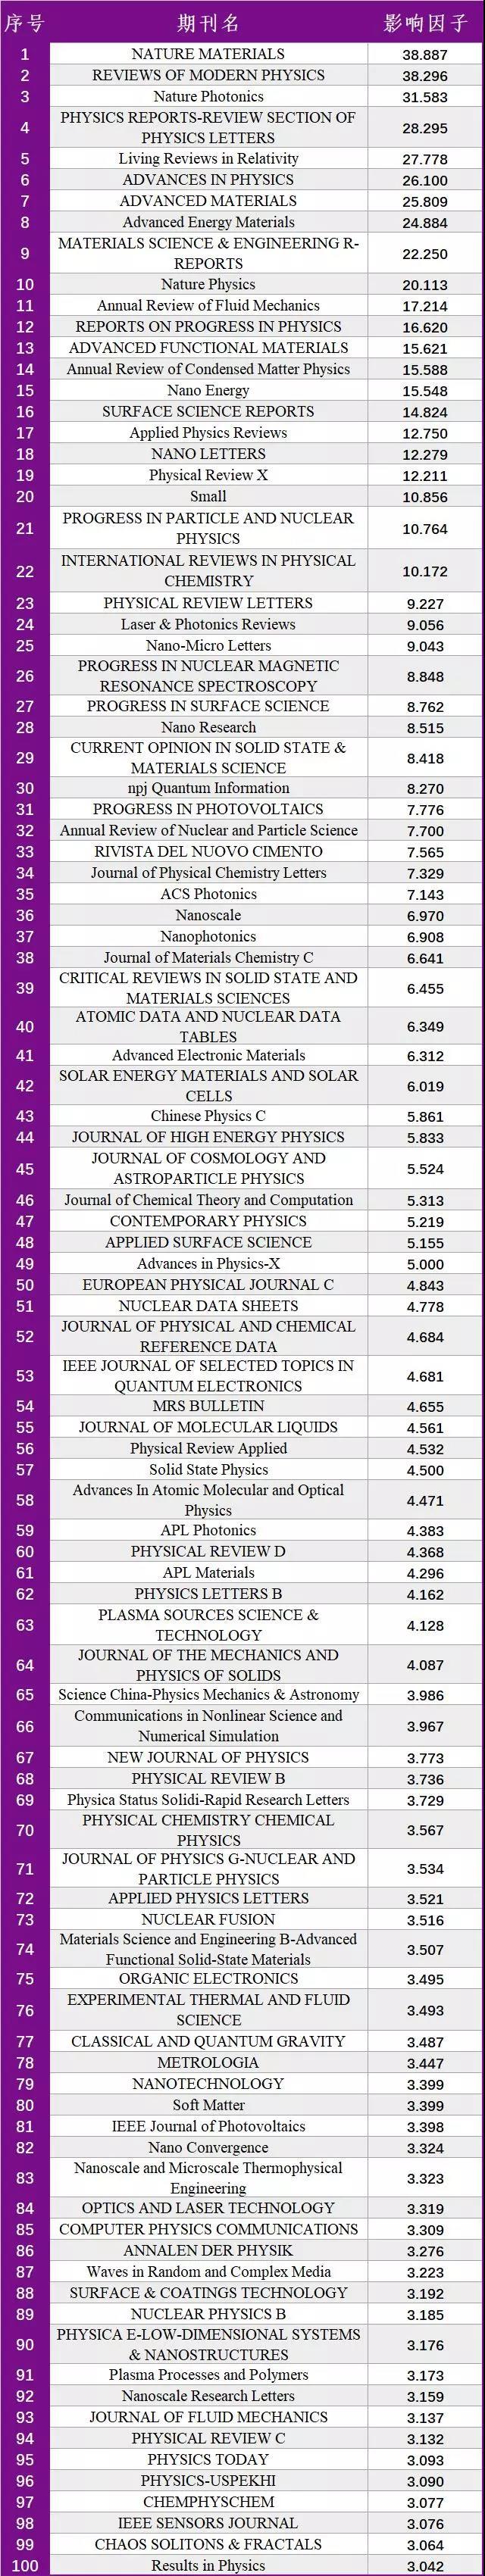 2018年 SCI影响因子 TOP 100